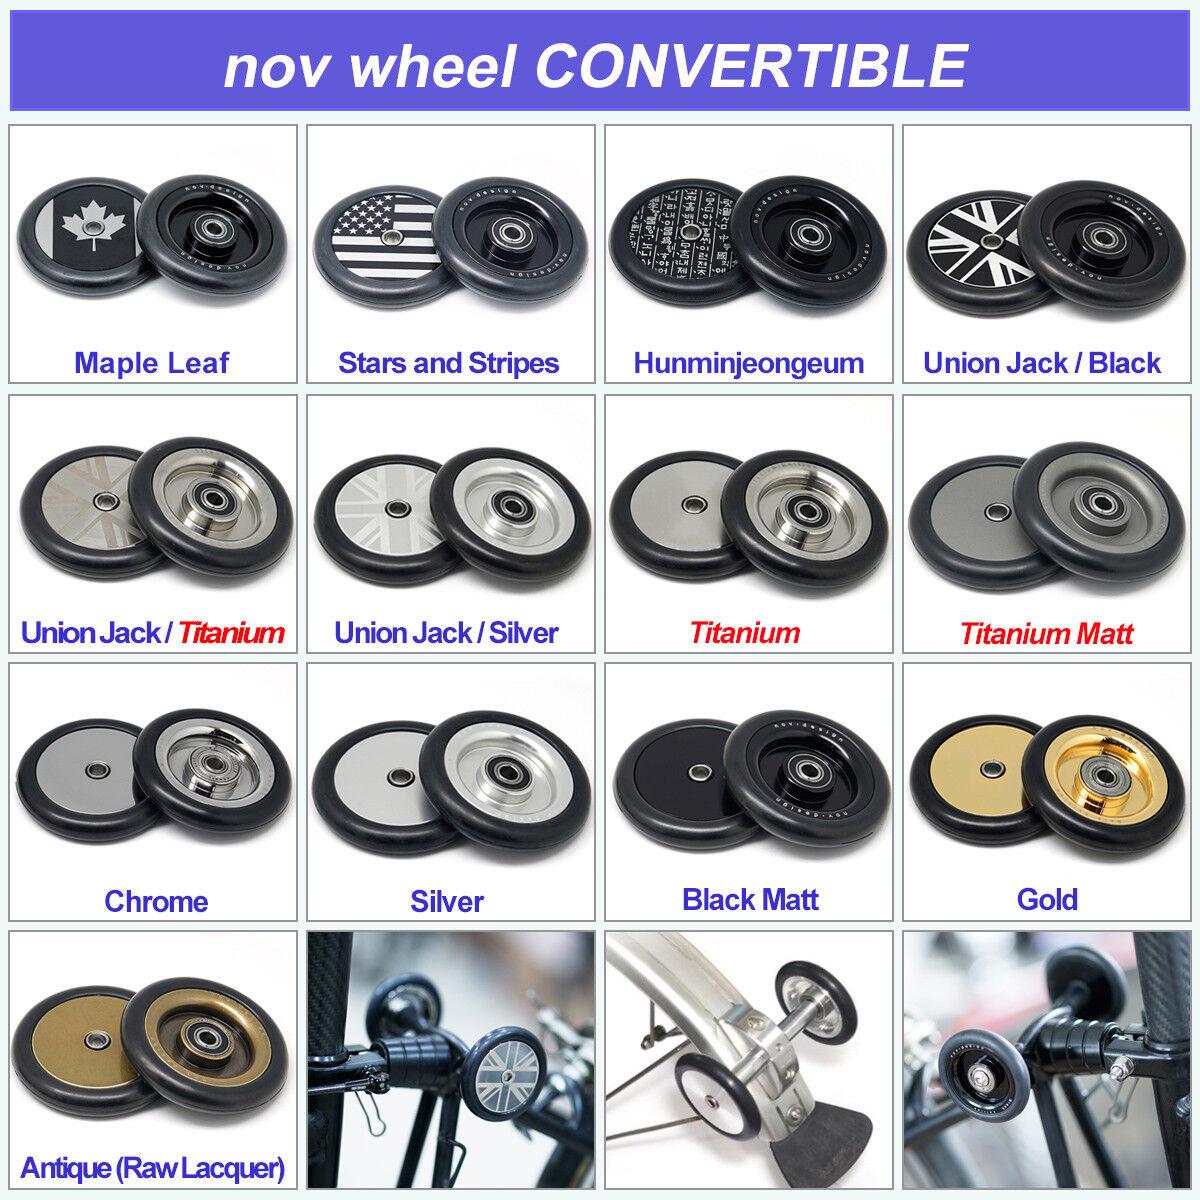 Nov wheel CONgreenIBLE set  for R-type Brompton (4pcs nov wheel) [novdesign]  amazing colorways